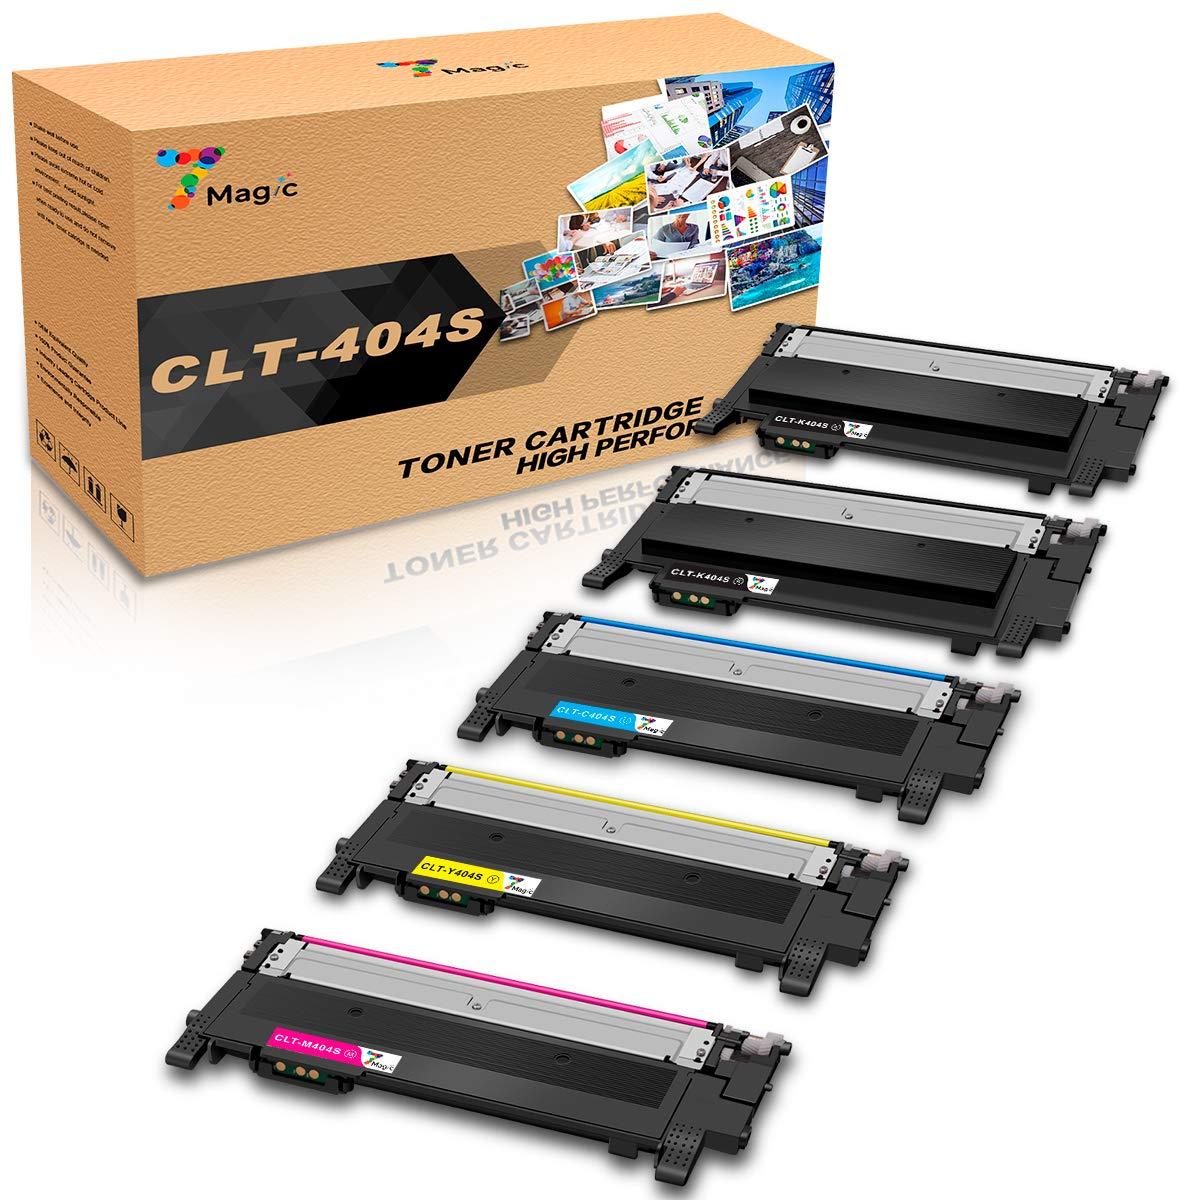 CLT-404,7Magic Tóner Compatible con Samsung CLT-P404C CLT-404S, CLT-K404S CLT-C404S CLT-M404S CLT-Y404S, Compatible con Samsung Xpress SL C430 C430W ...